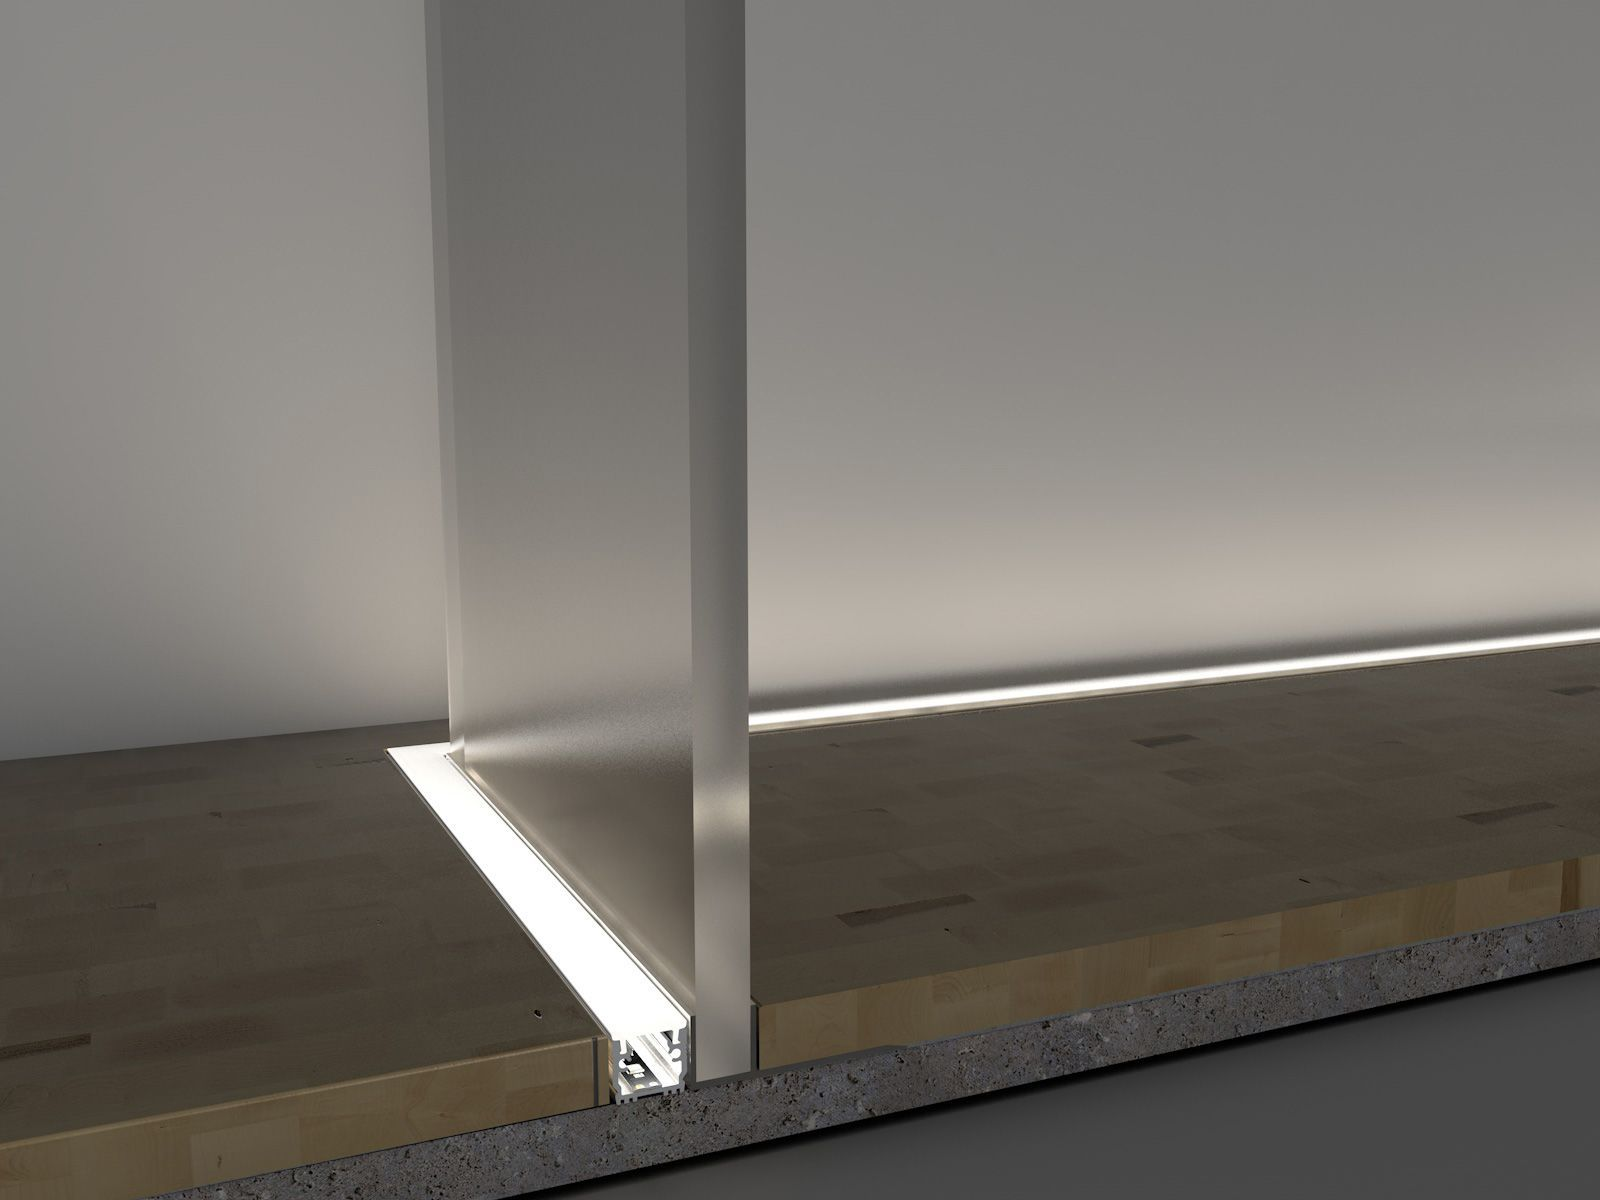 300cm Langes Und Abdichtbares Ip67 Led Alu Bodenpr 43 50 Badezimmer Led Dusche Beleuchtung Led